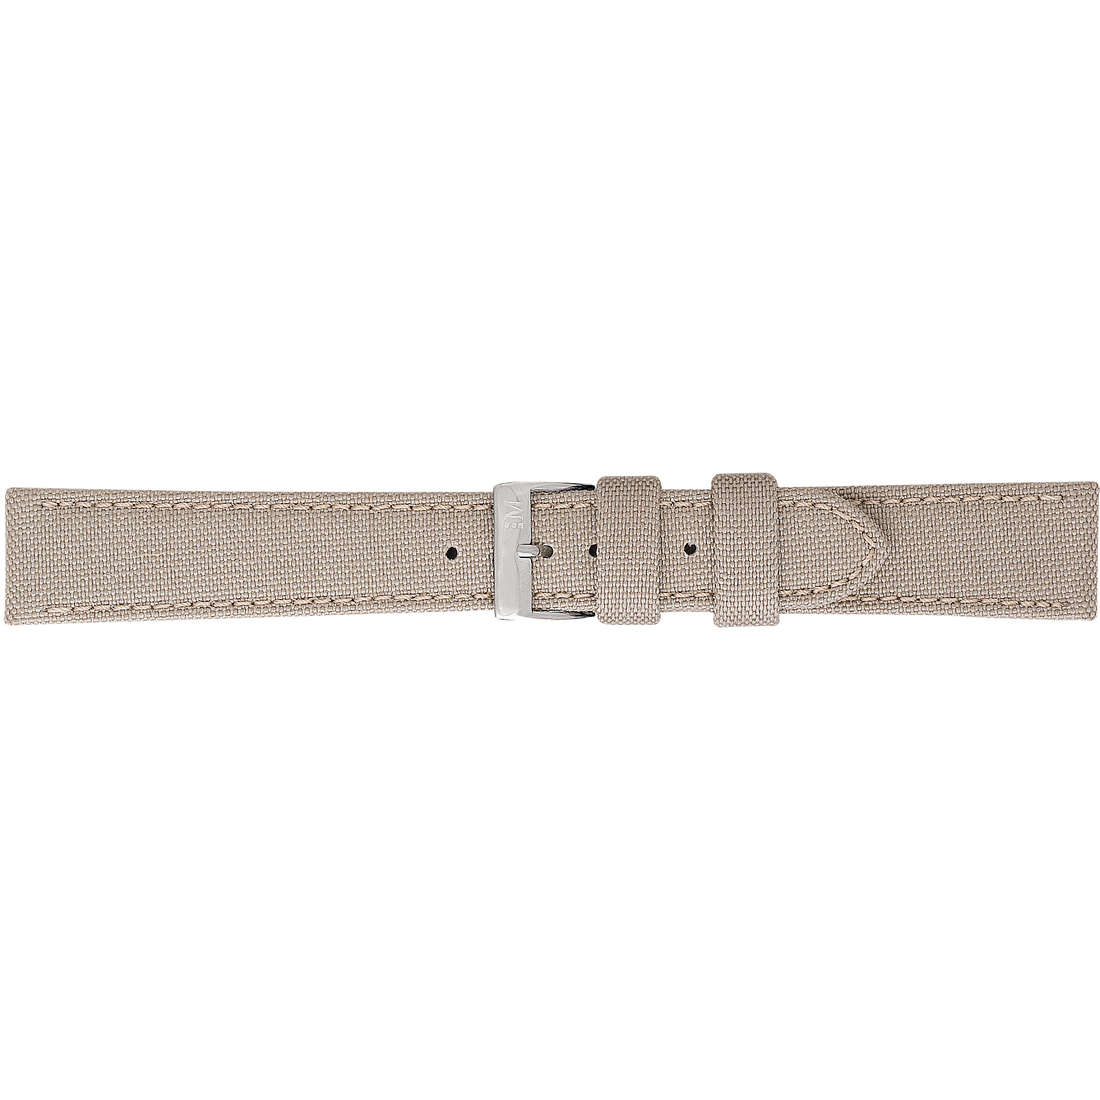 watch watch bands watch straps man Morellato Linea Sport A01U2779110026CR20